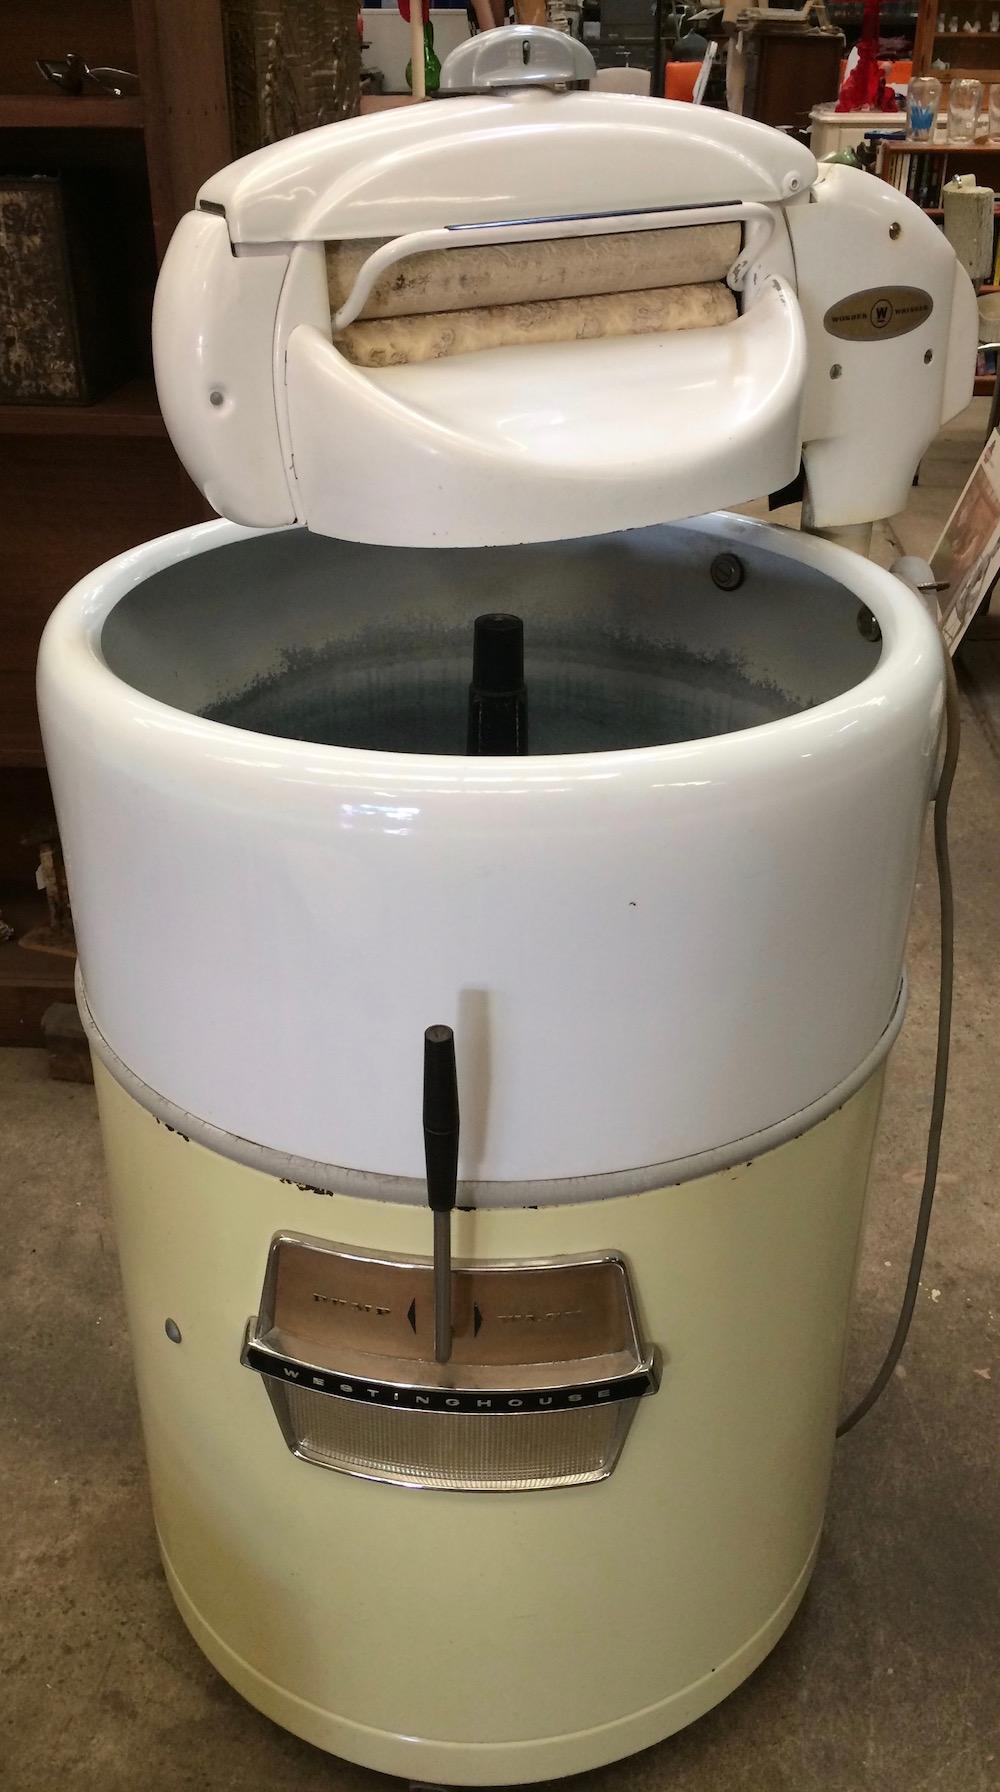 Vintage Westinghouse Wringer Washer With Instruction